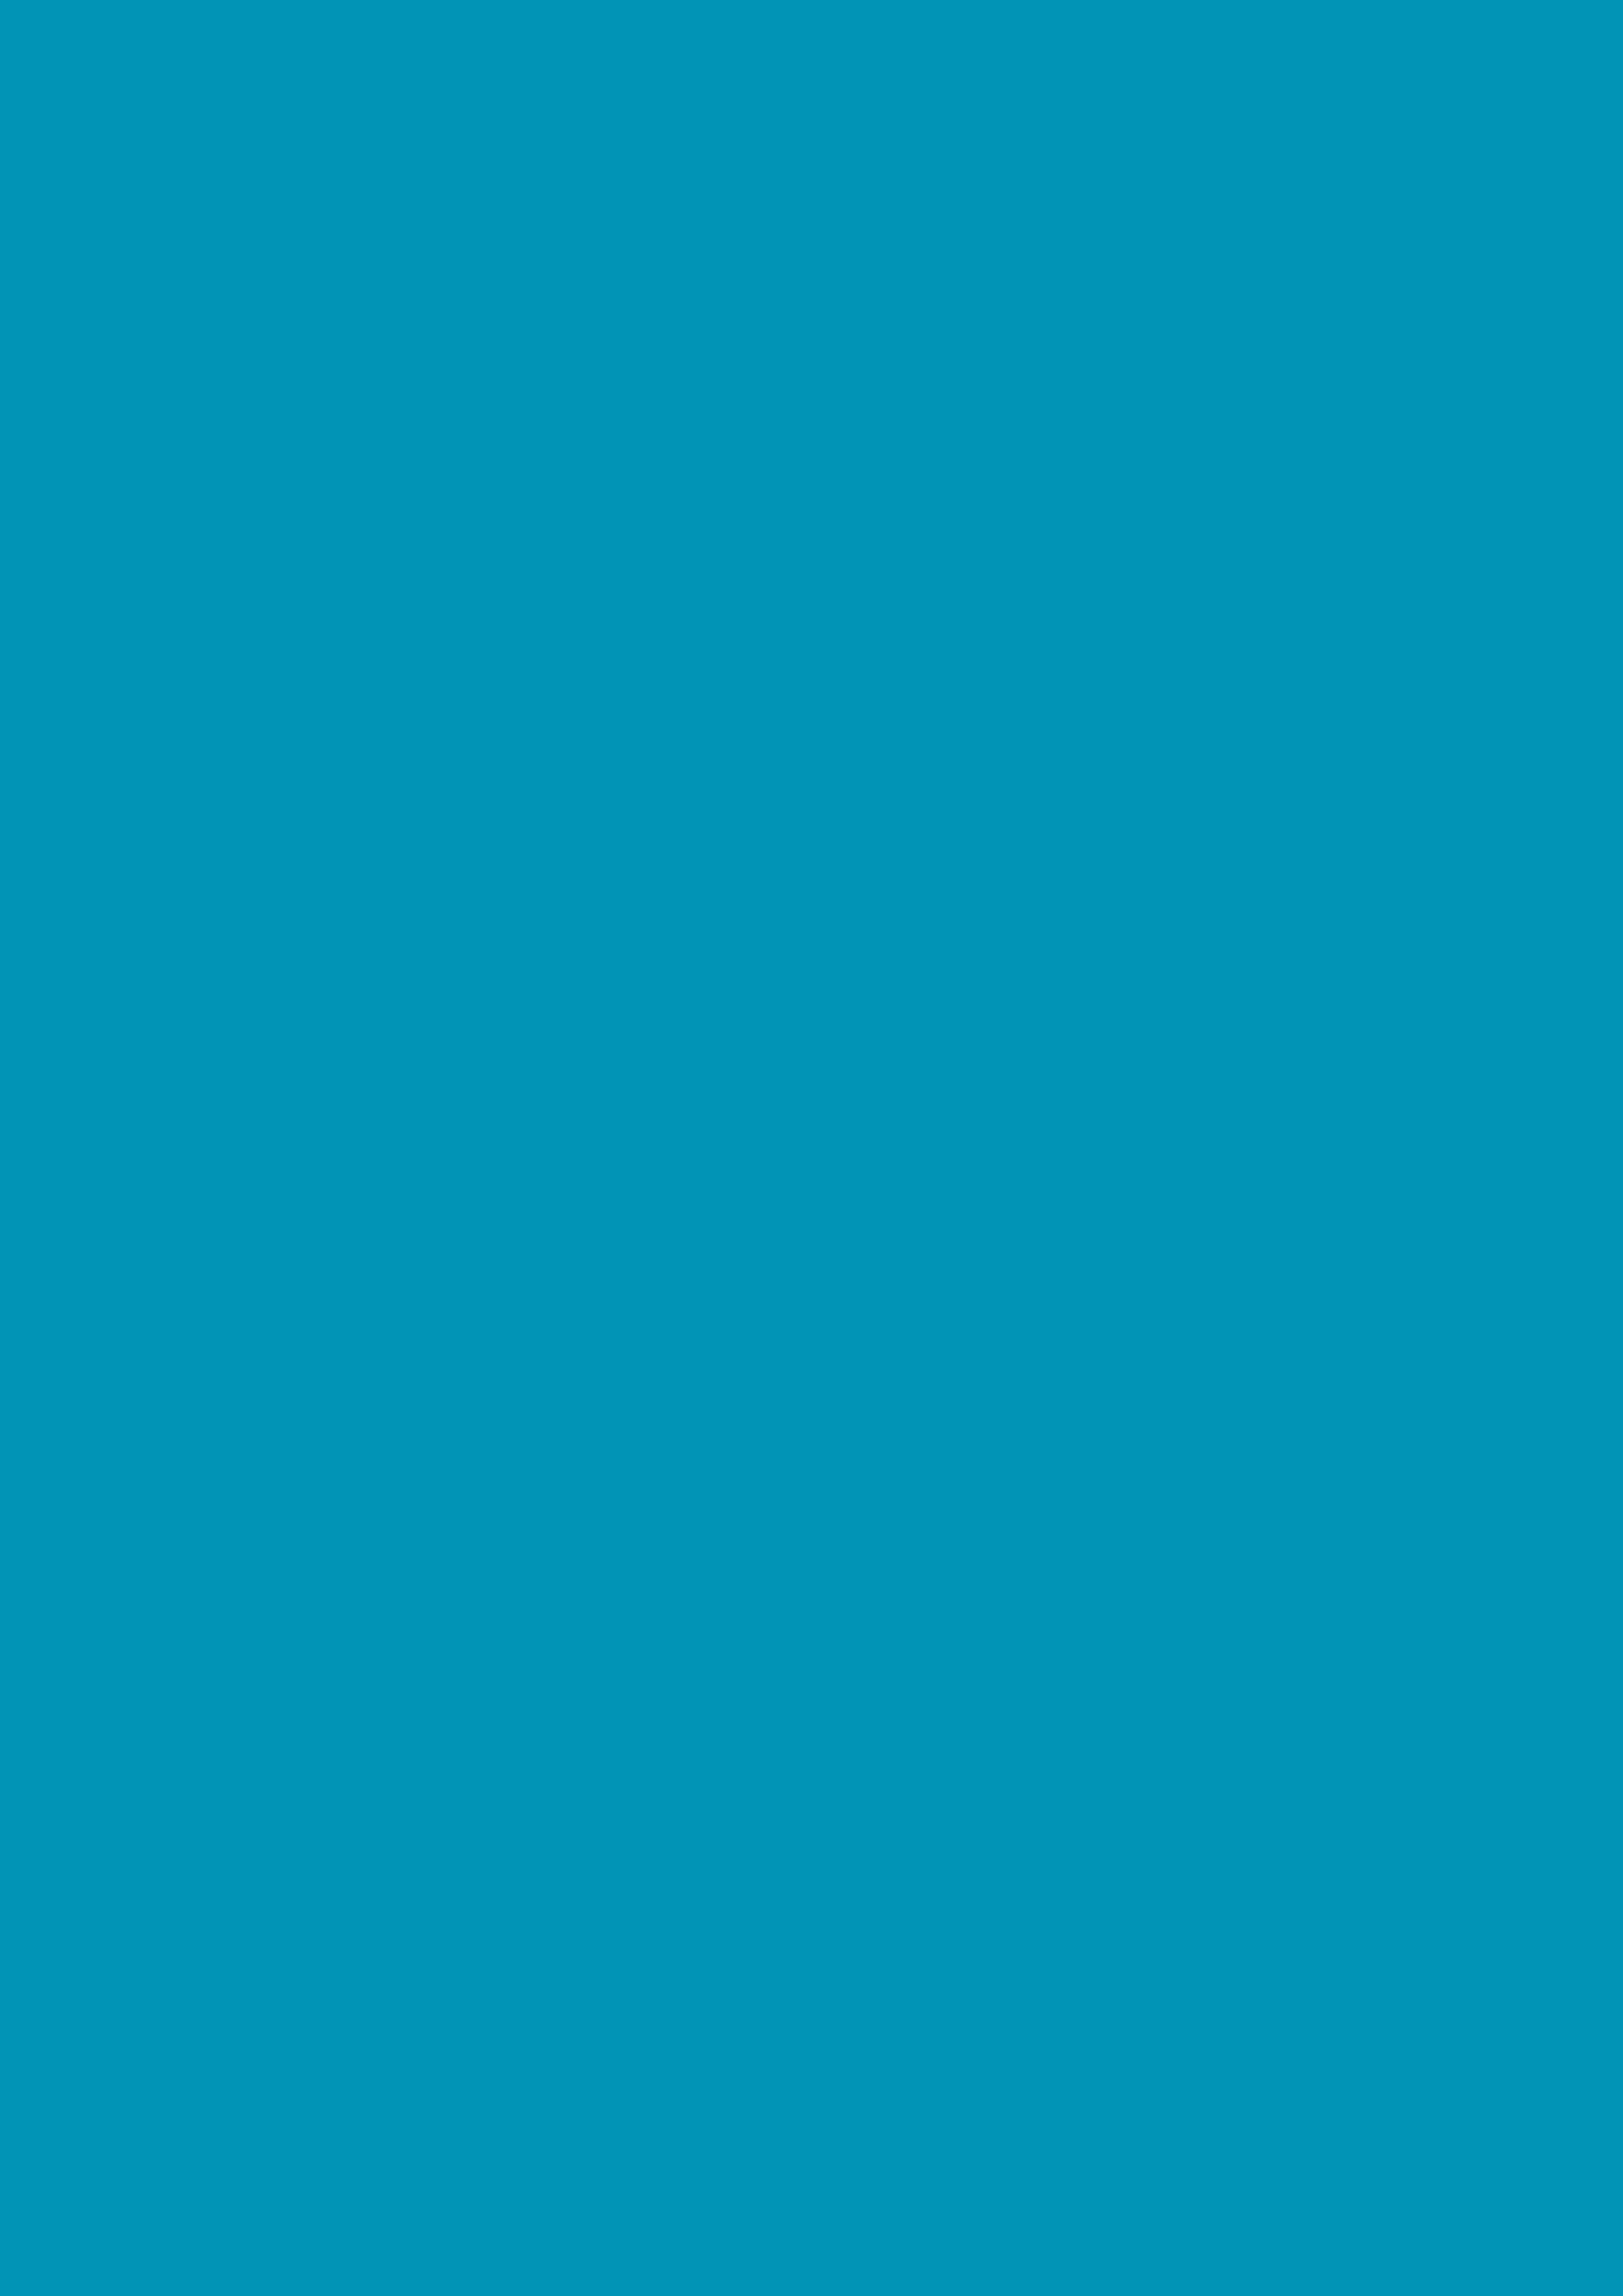 2480x3508 Bondi Blue Solid Color Background